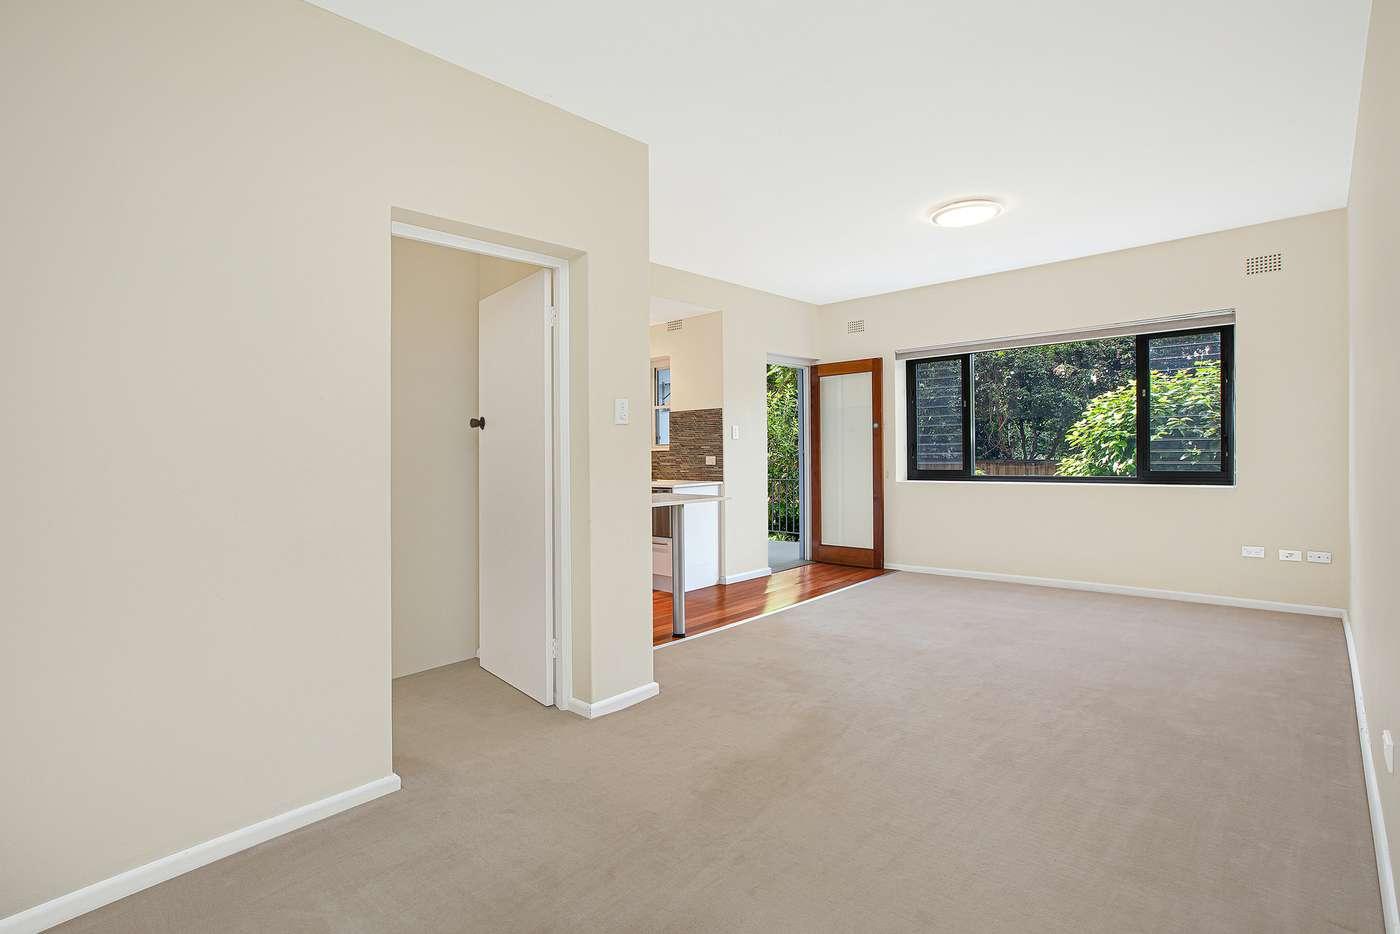 Main view of Homely apartment listing, 3/9 Mandolong Road, Mosman NSW 2088